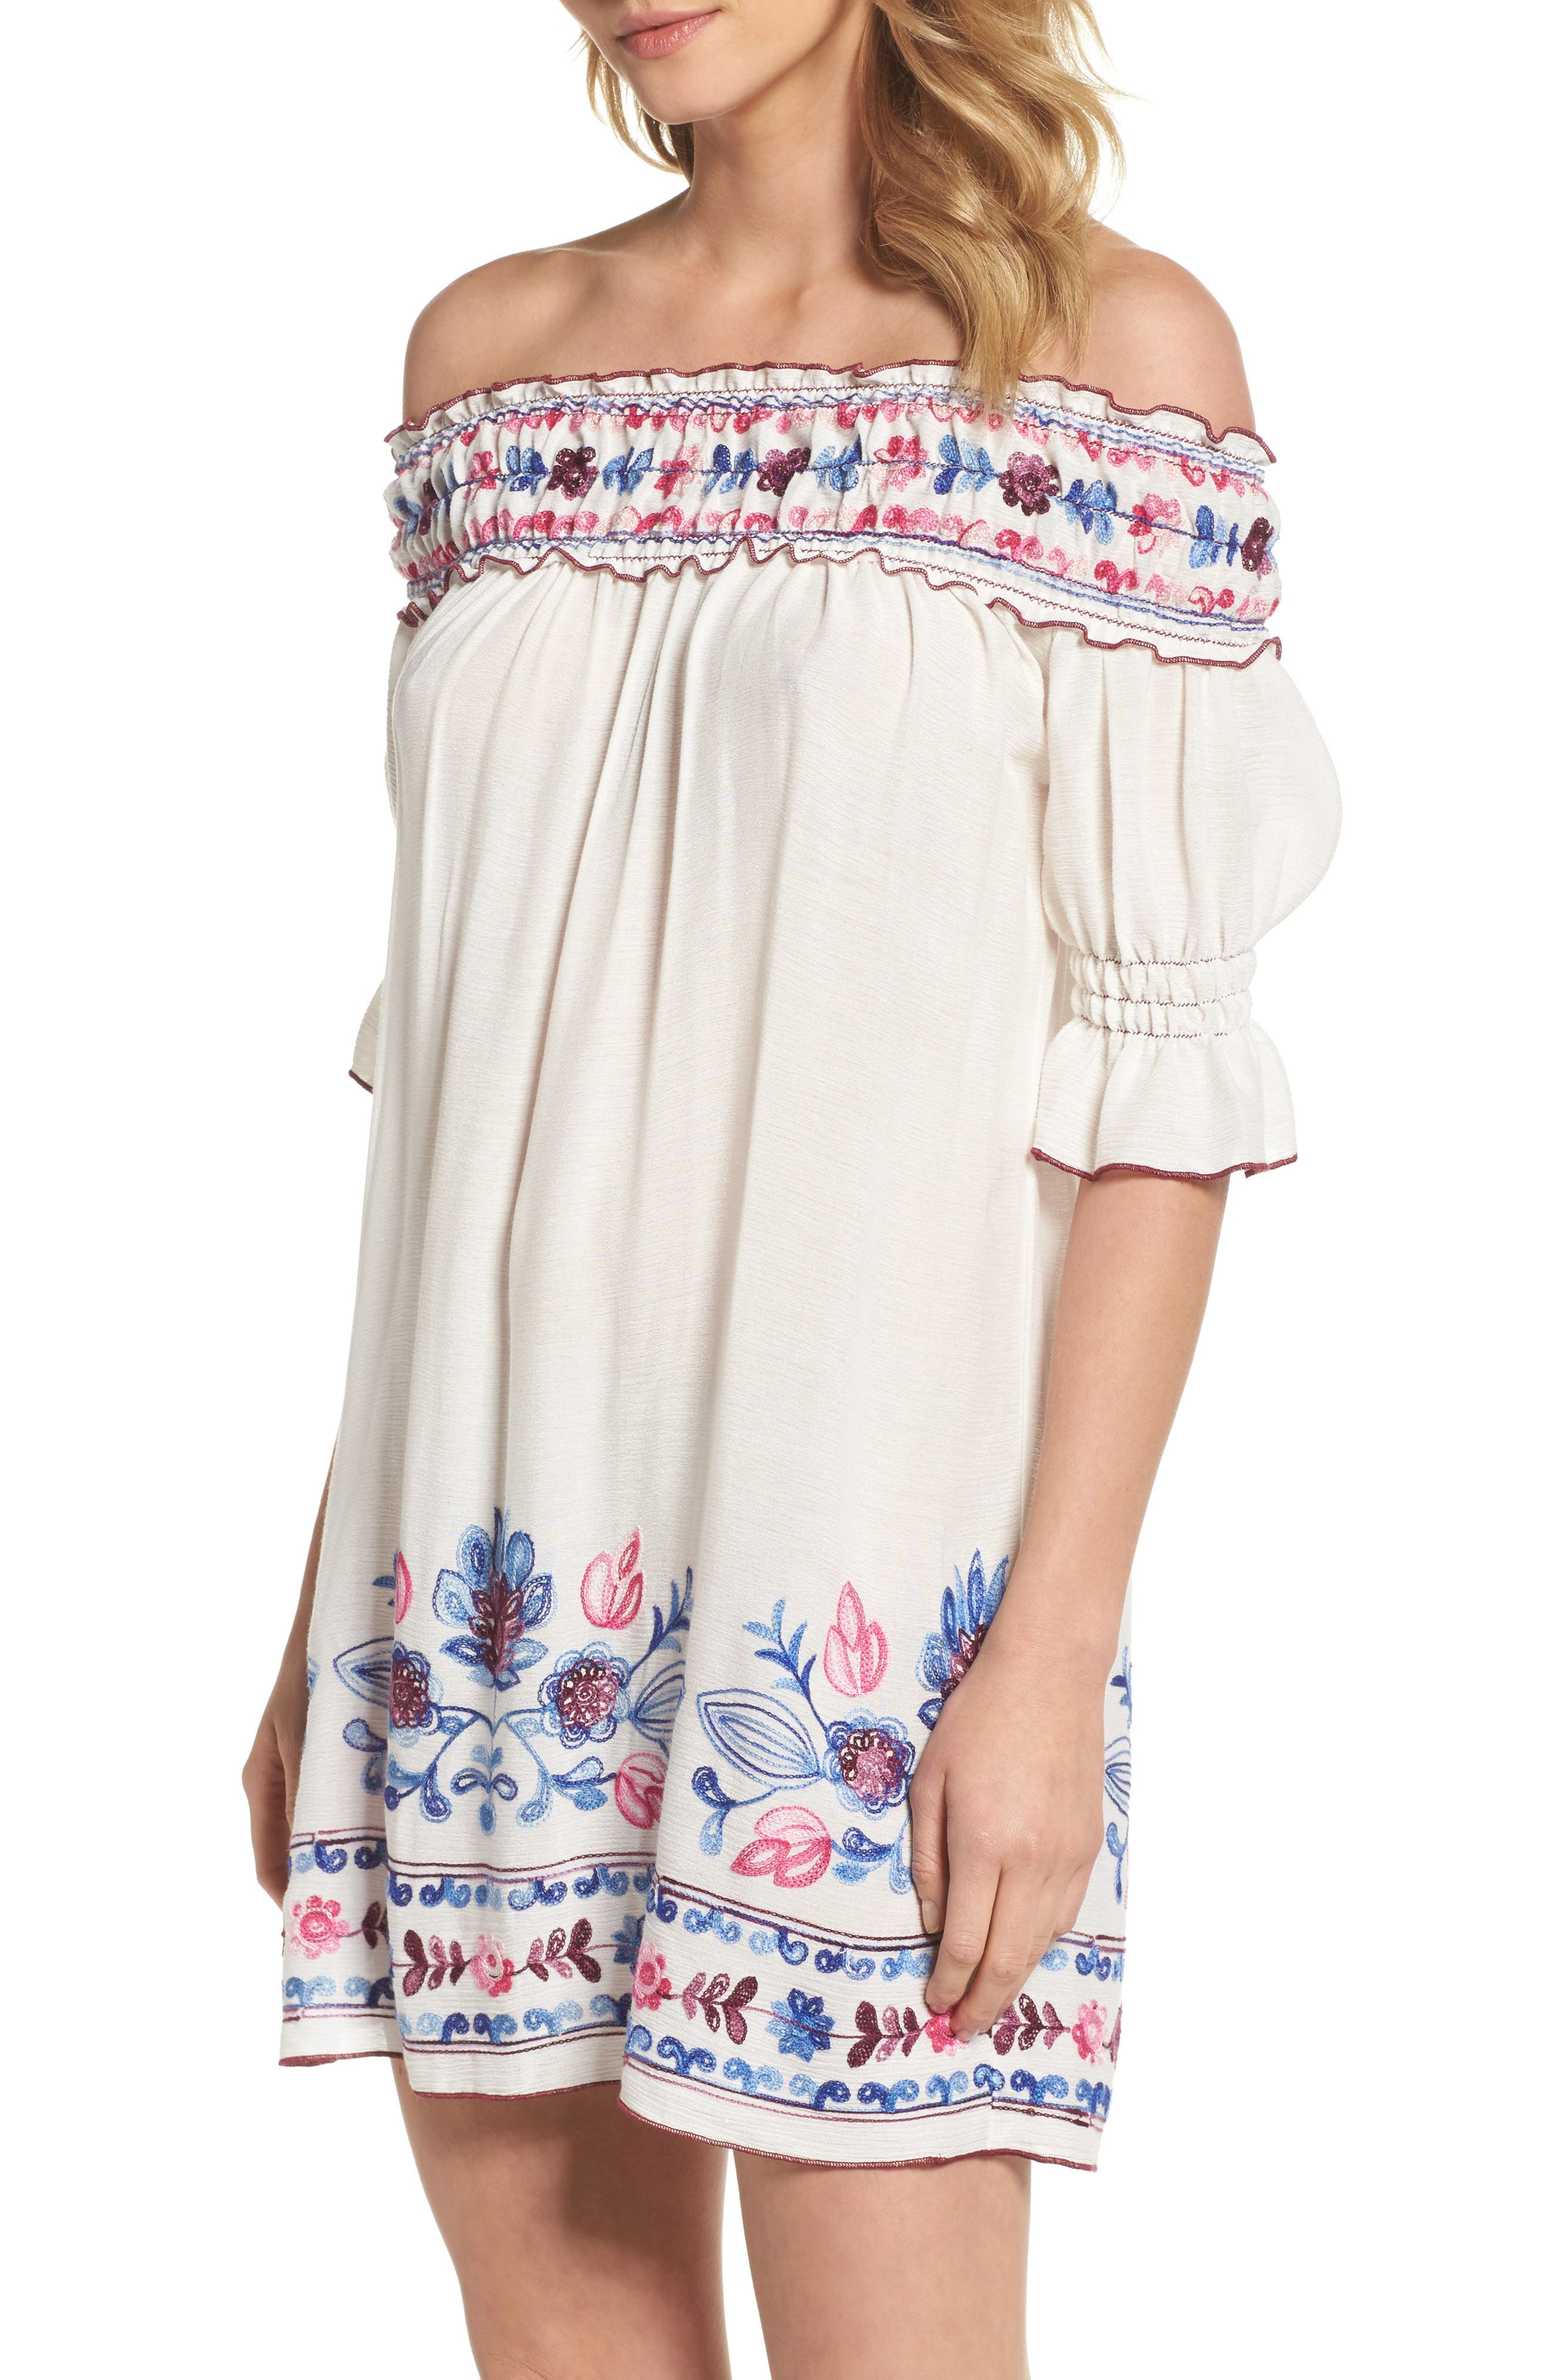 Main Image - Becca Marrakesh Market Off the Shoulder Cover-Up Dress